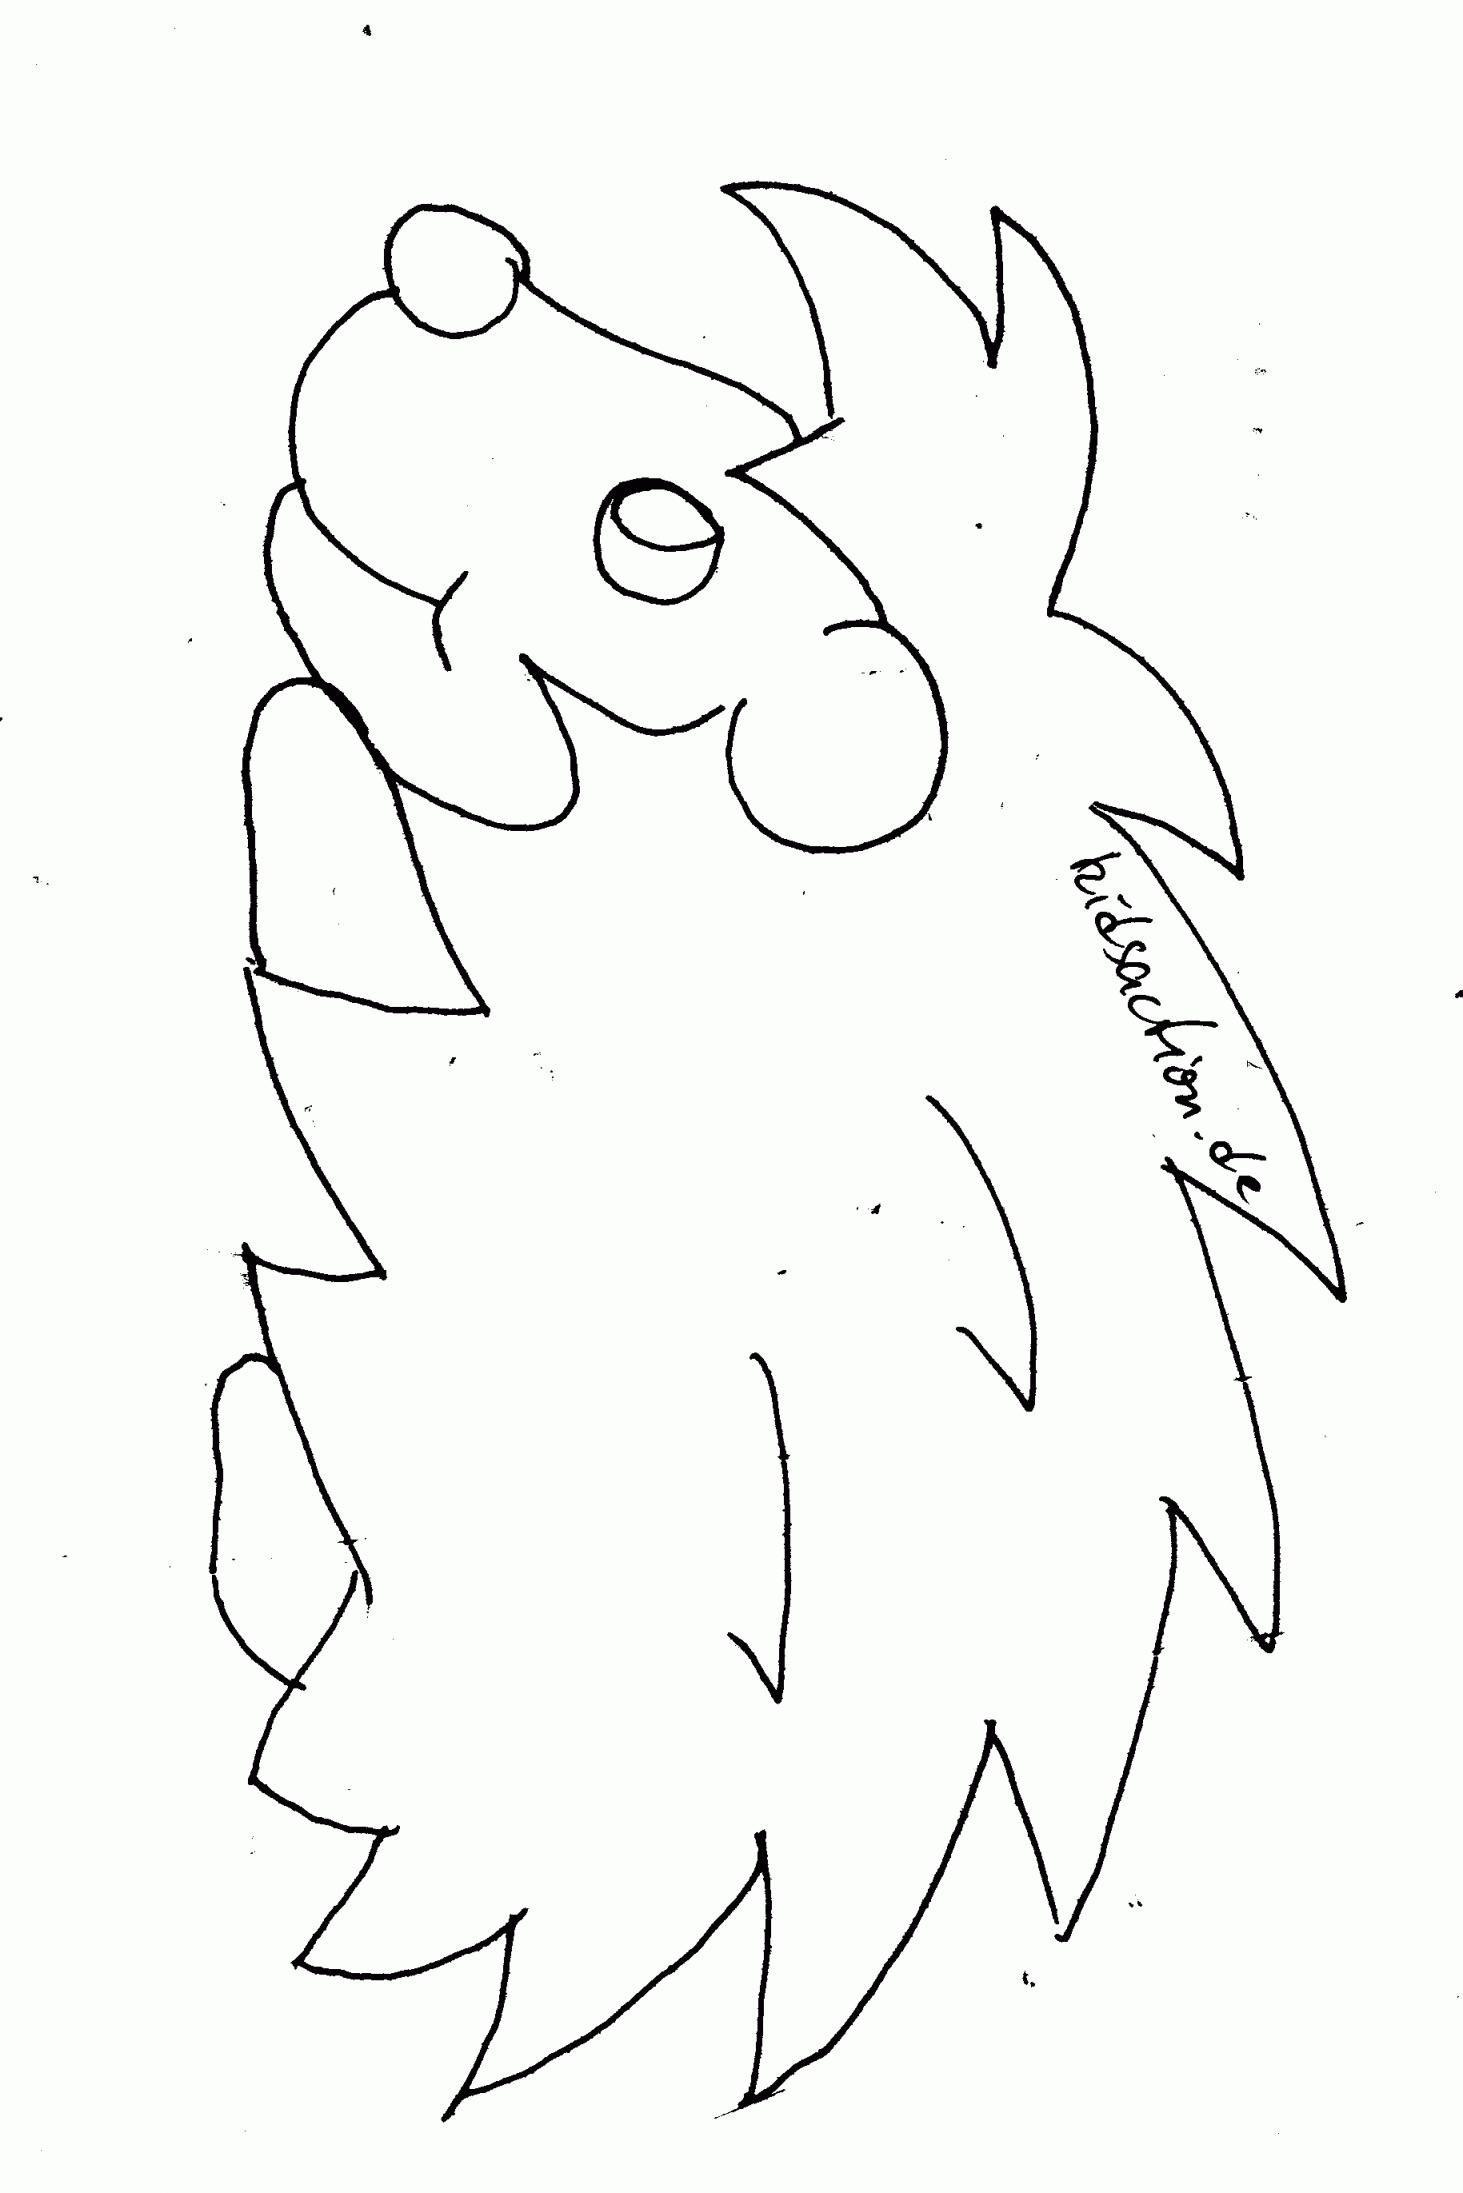 Ninjago Kai Ausmalbilder Frisch Malvorlagen Igel Elegant Igel Grundschule 0d Archives Uploadertalk Das Bild